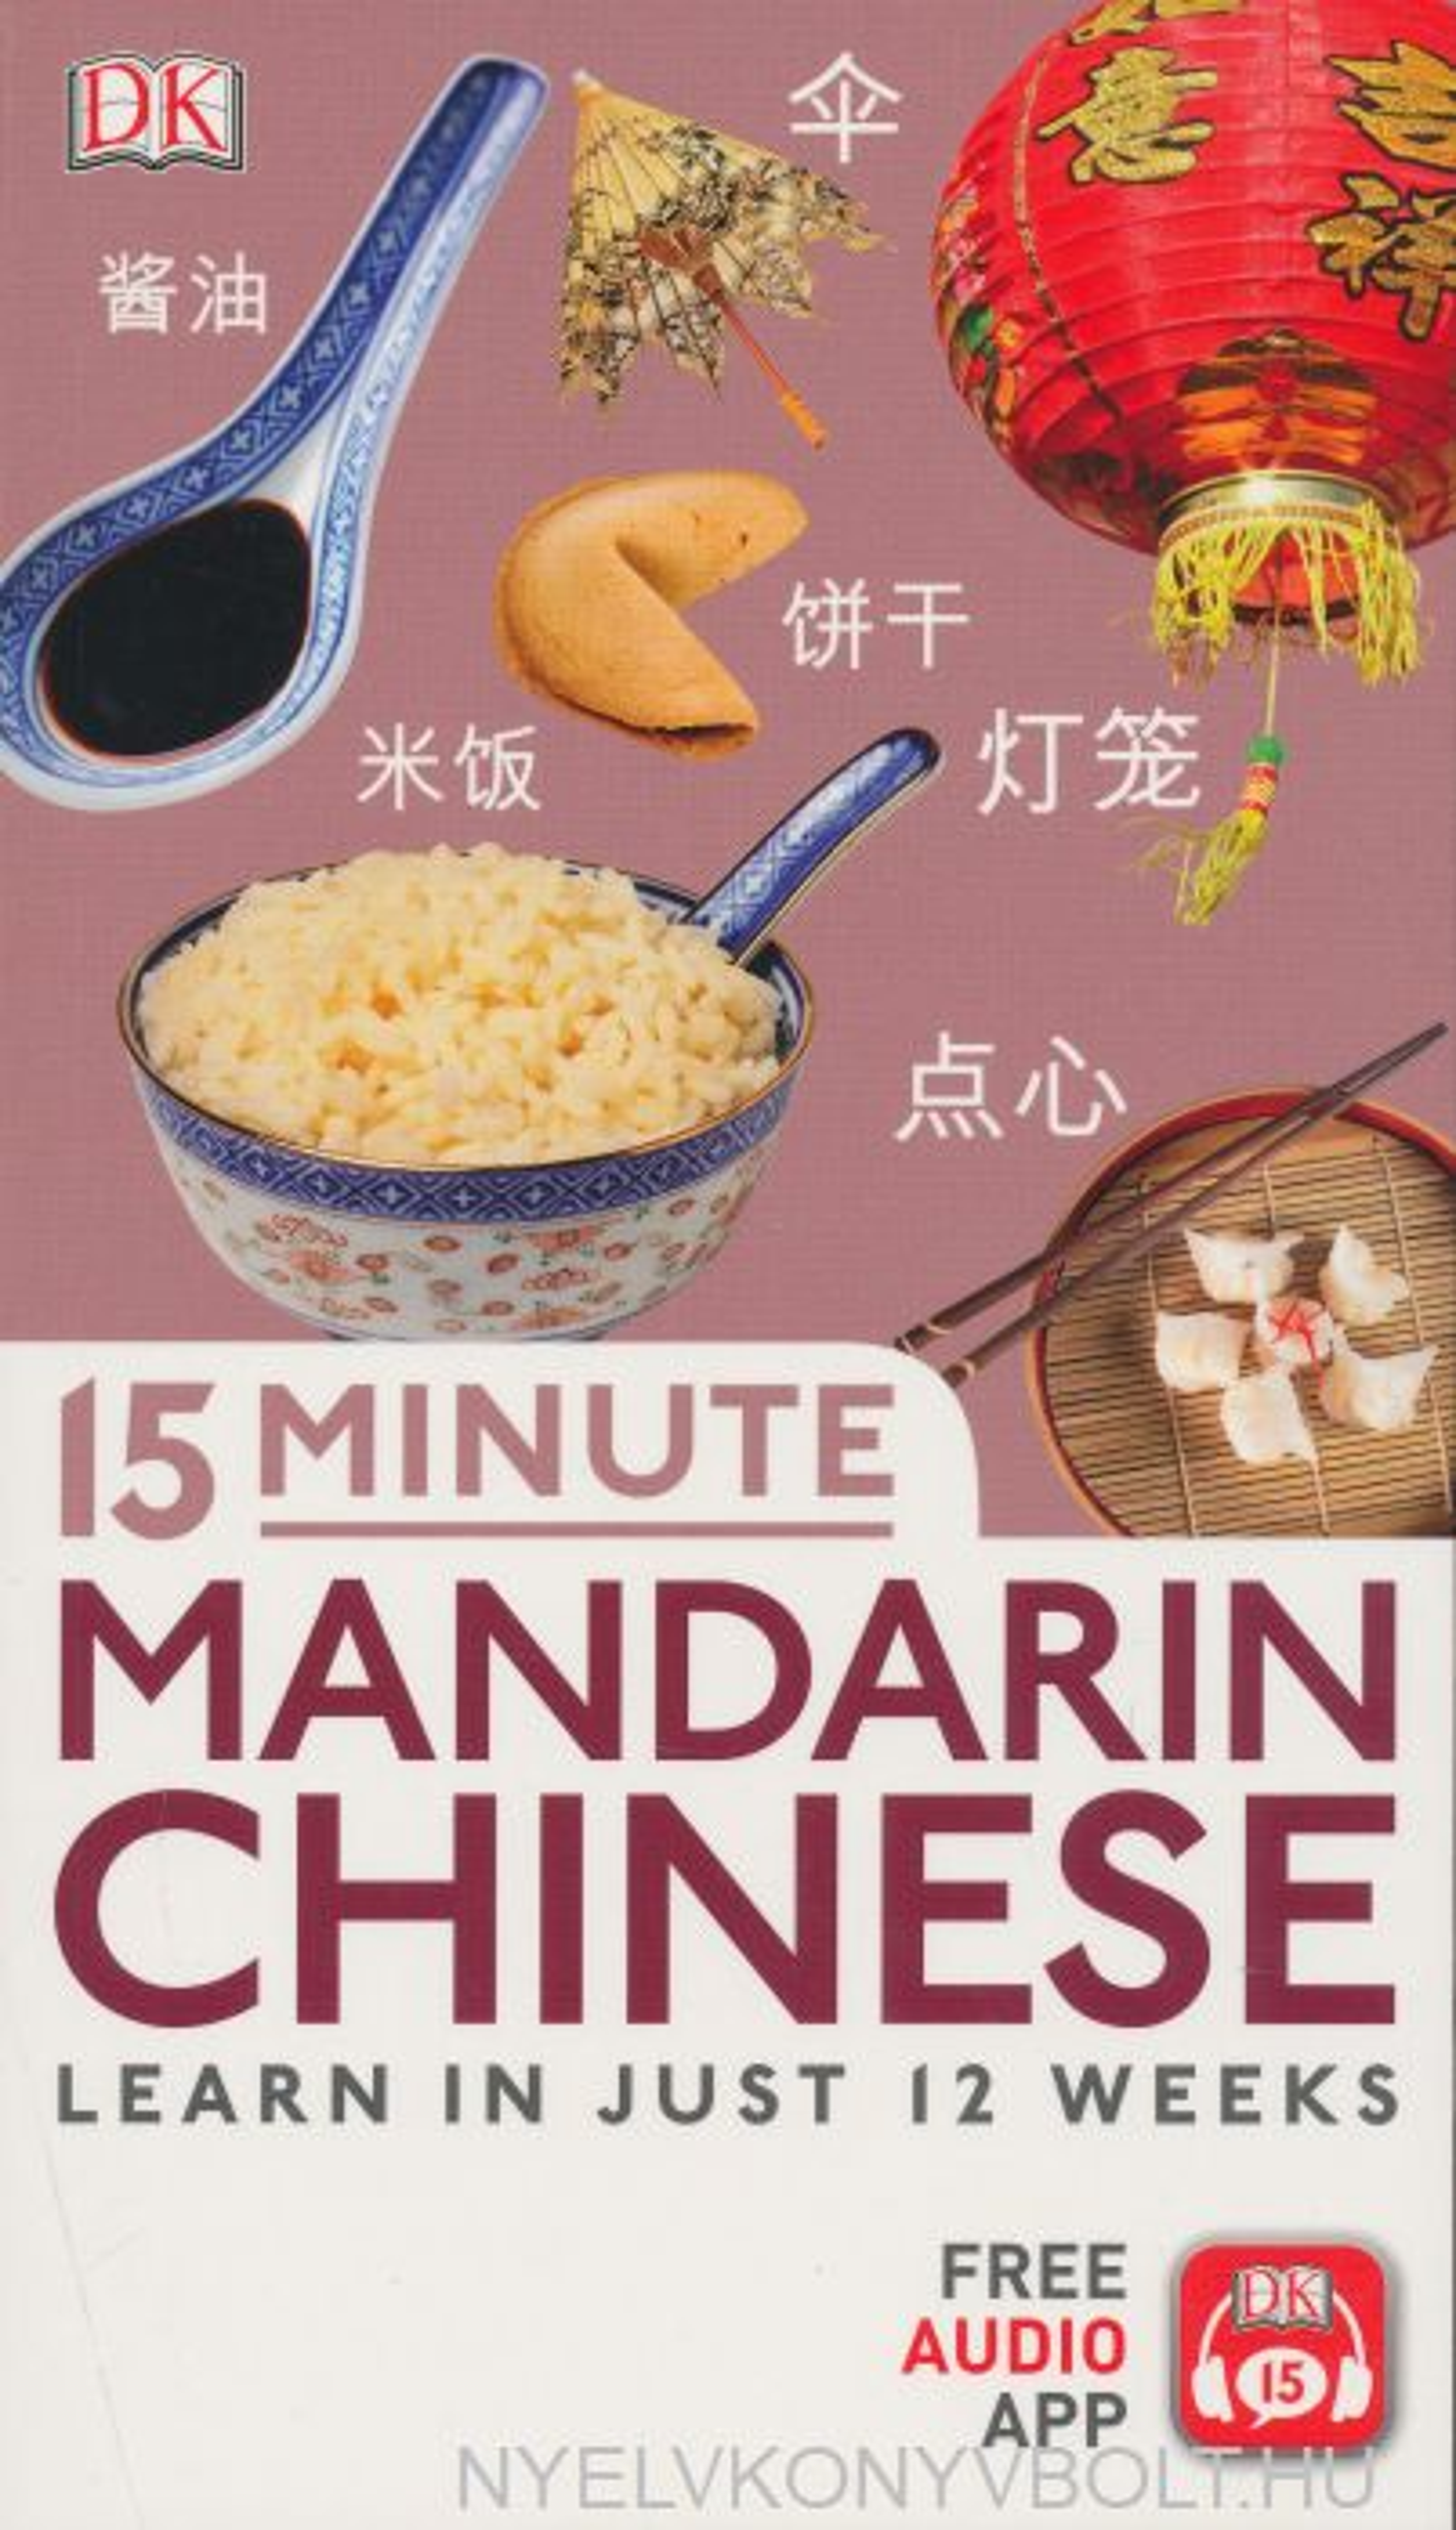 15 Minute Mandarin Chinese - Learn in just 12 weeks - Free Audio App